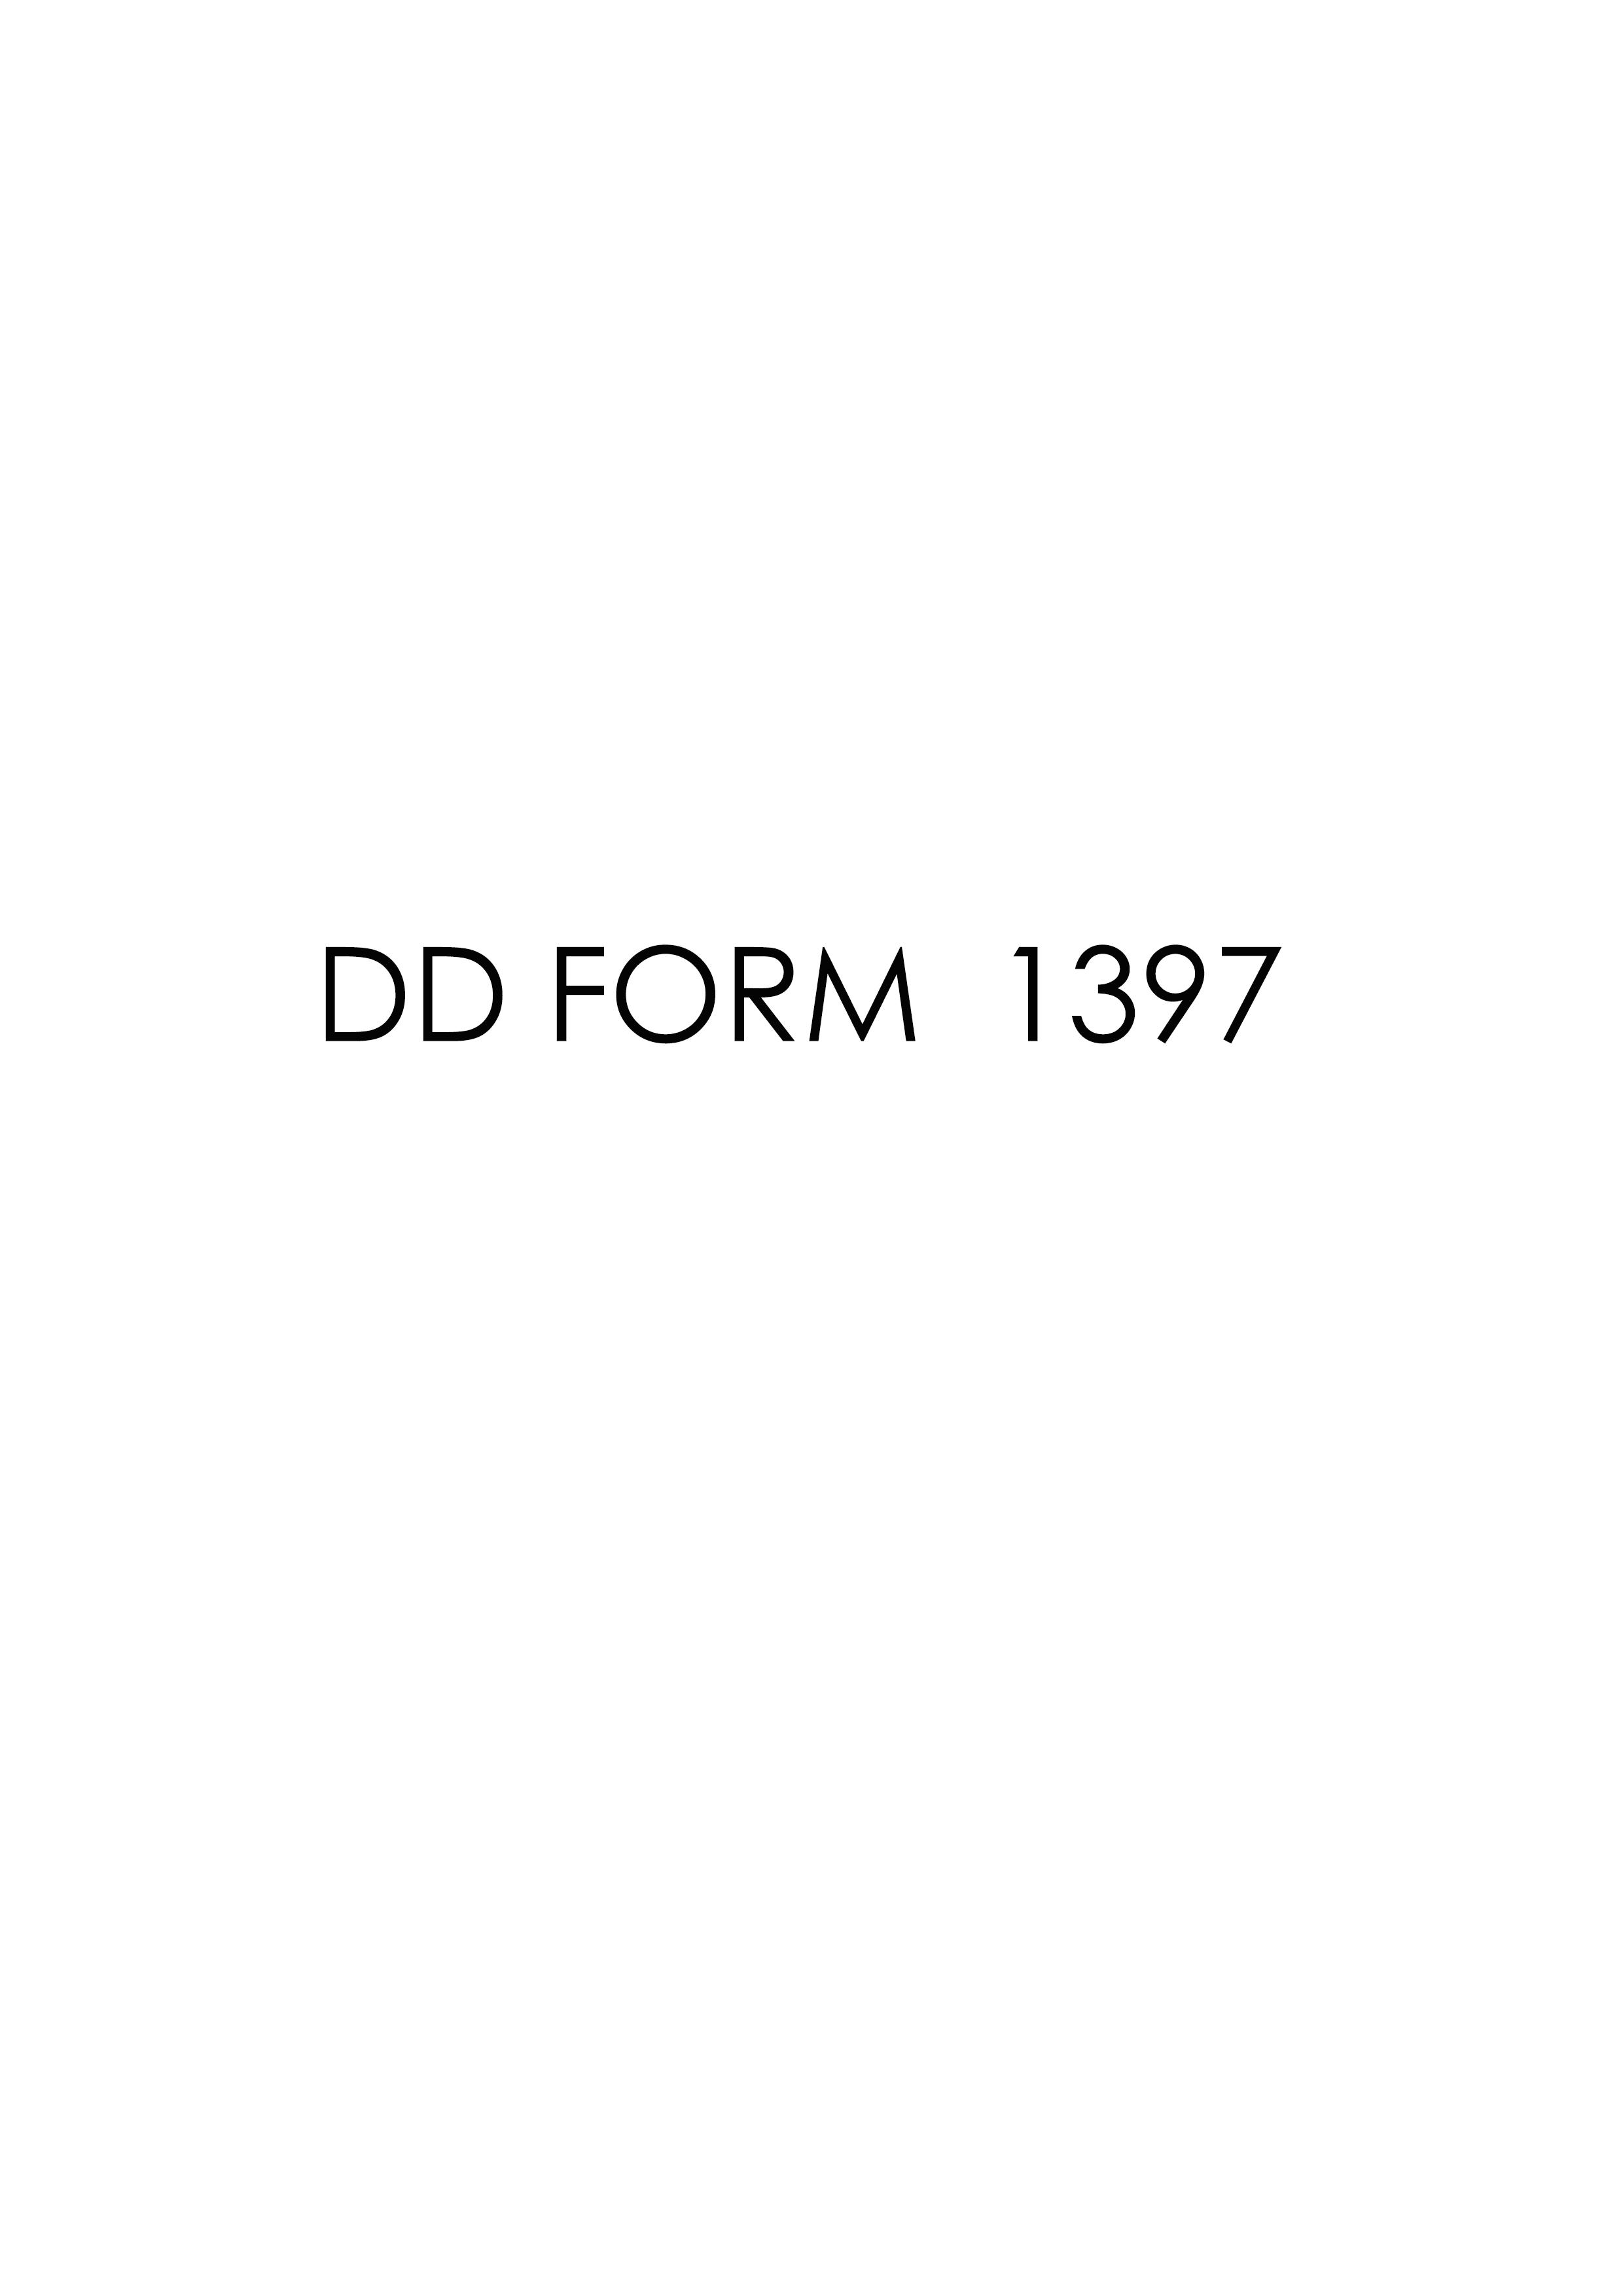 Download dd Form 1397 Free